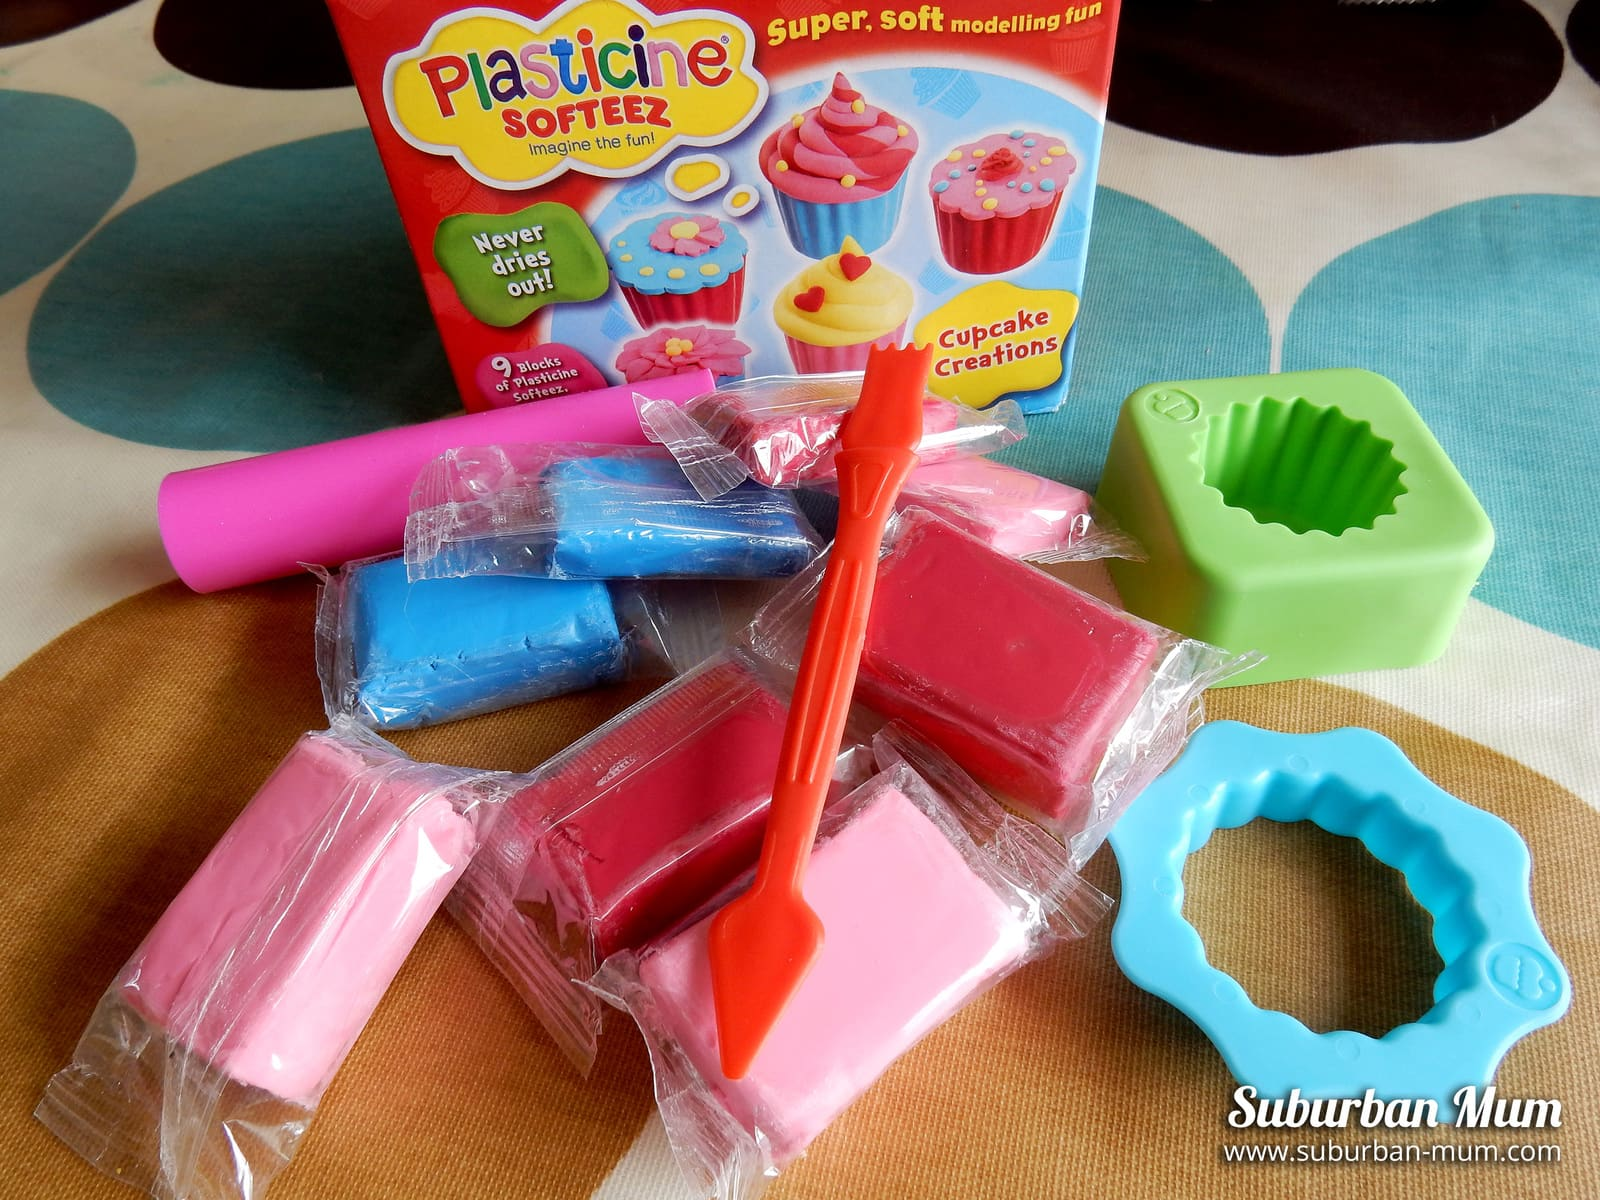 Softeez Cupcake Creations Kit